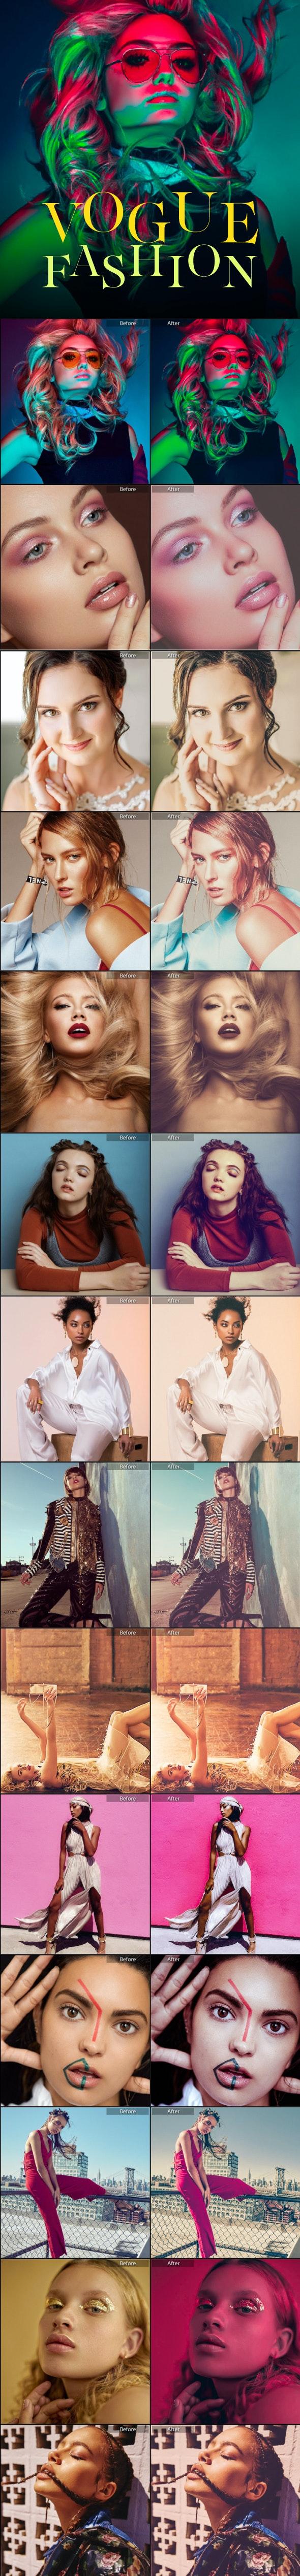 21 Premium Vogue Fashion Lightroom Presets - Portrait Lightroom Presets